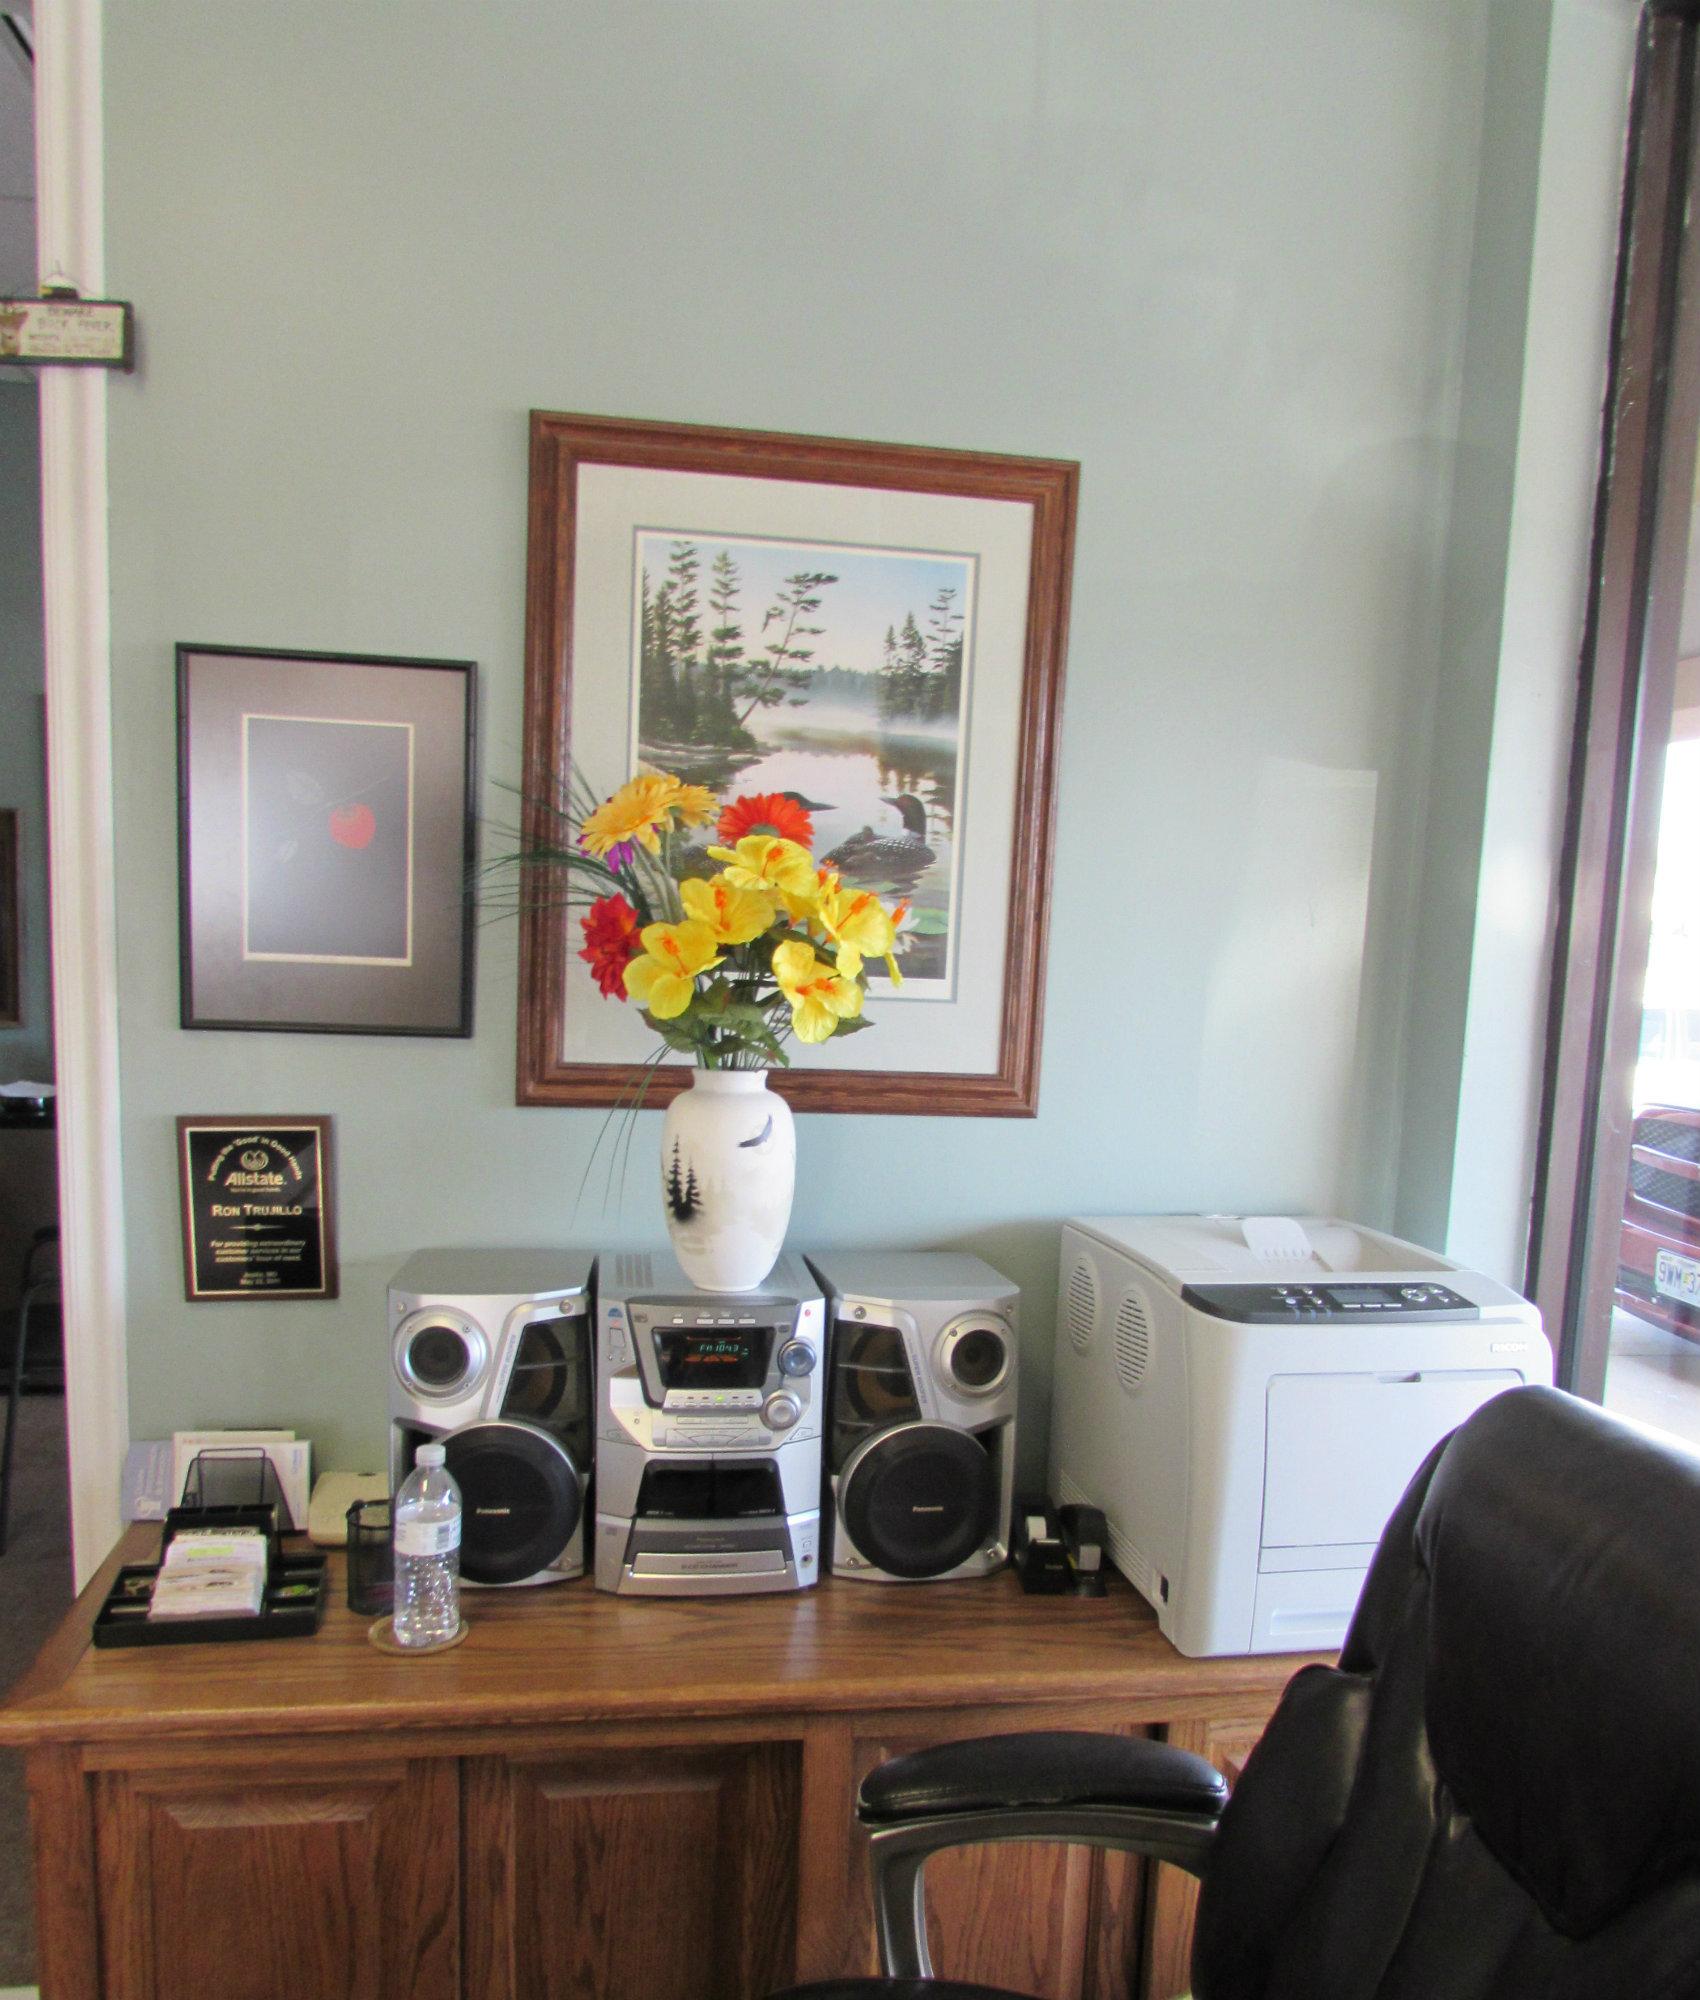 Ron Trujillo FSS: Allstate Insurance image 2